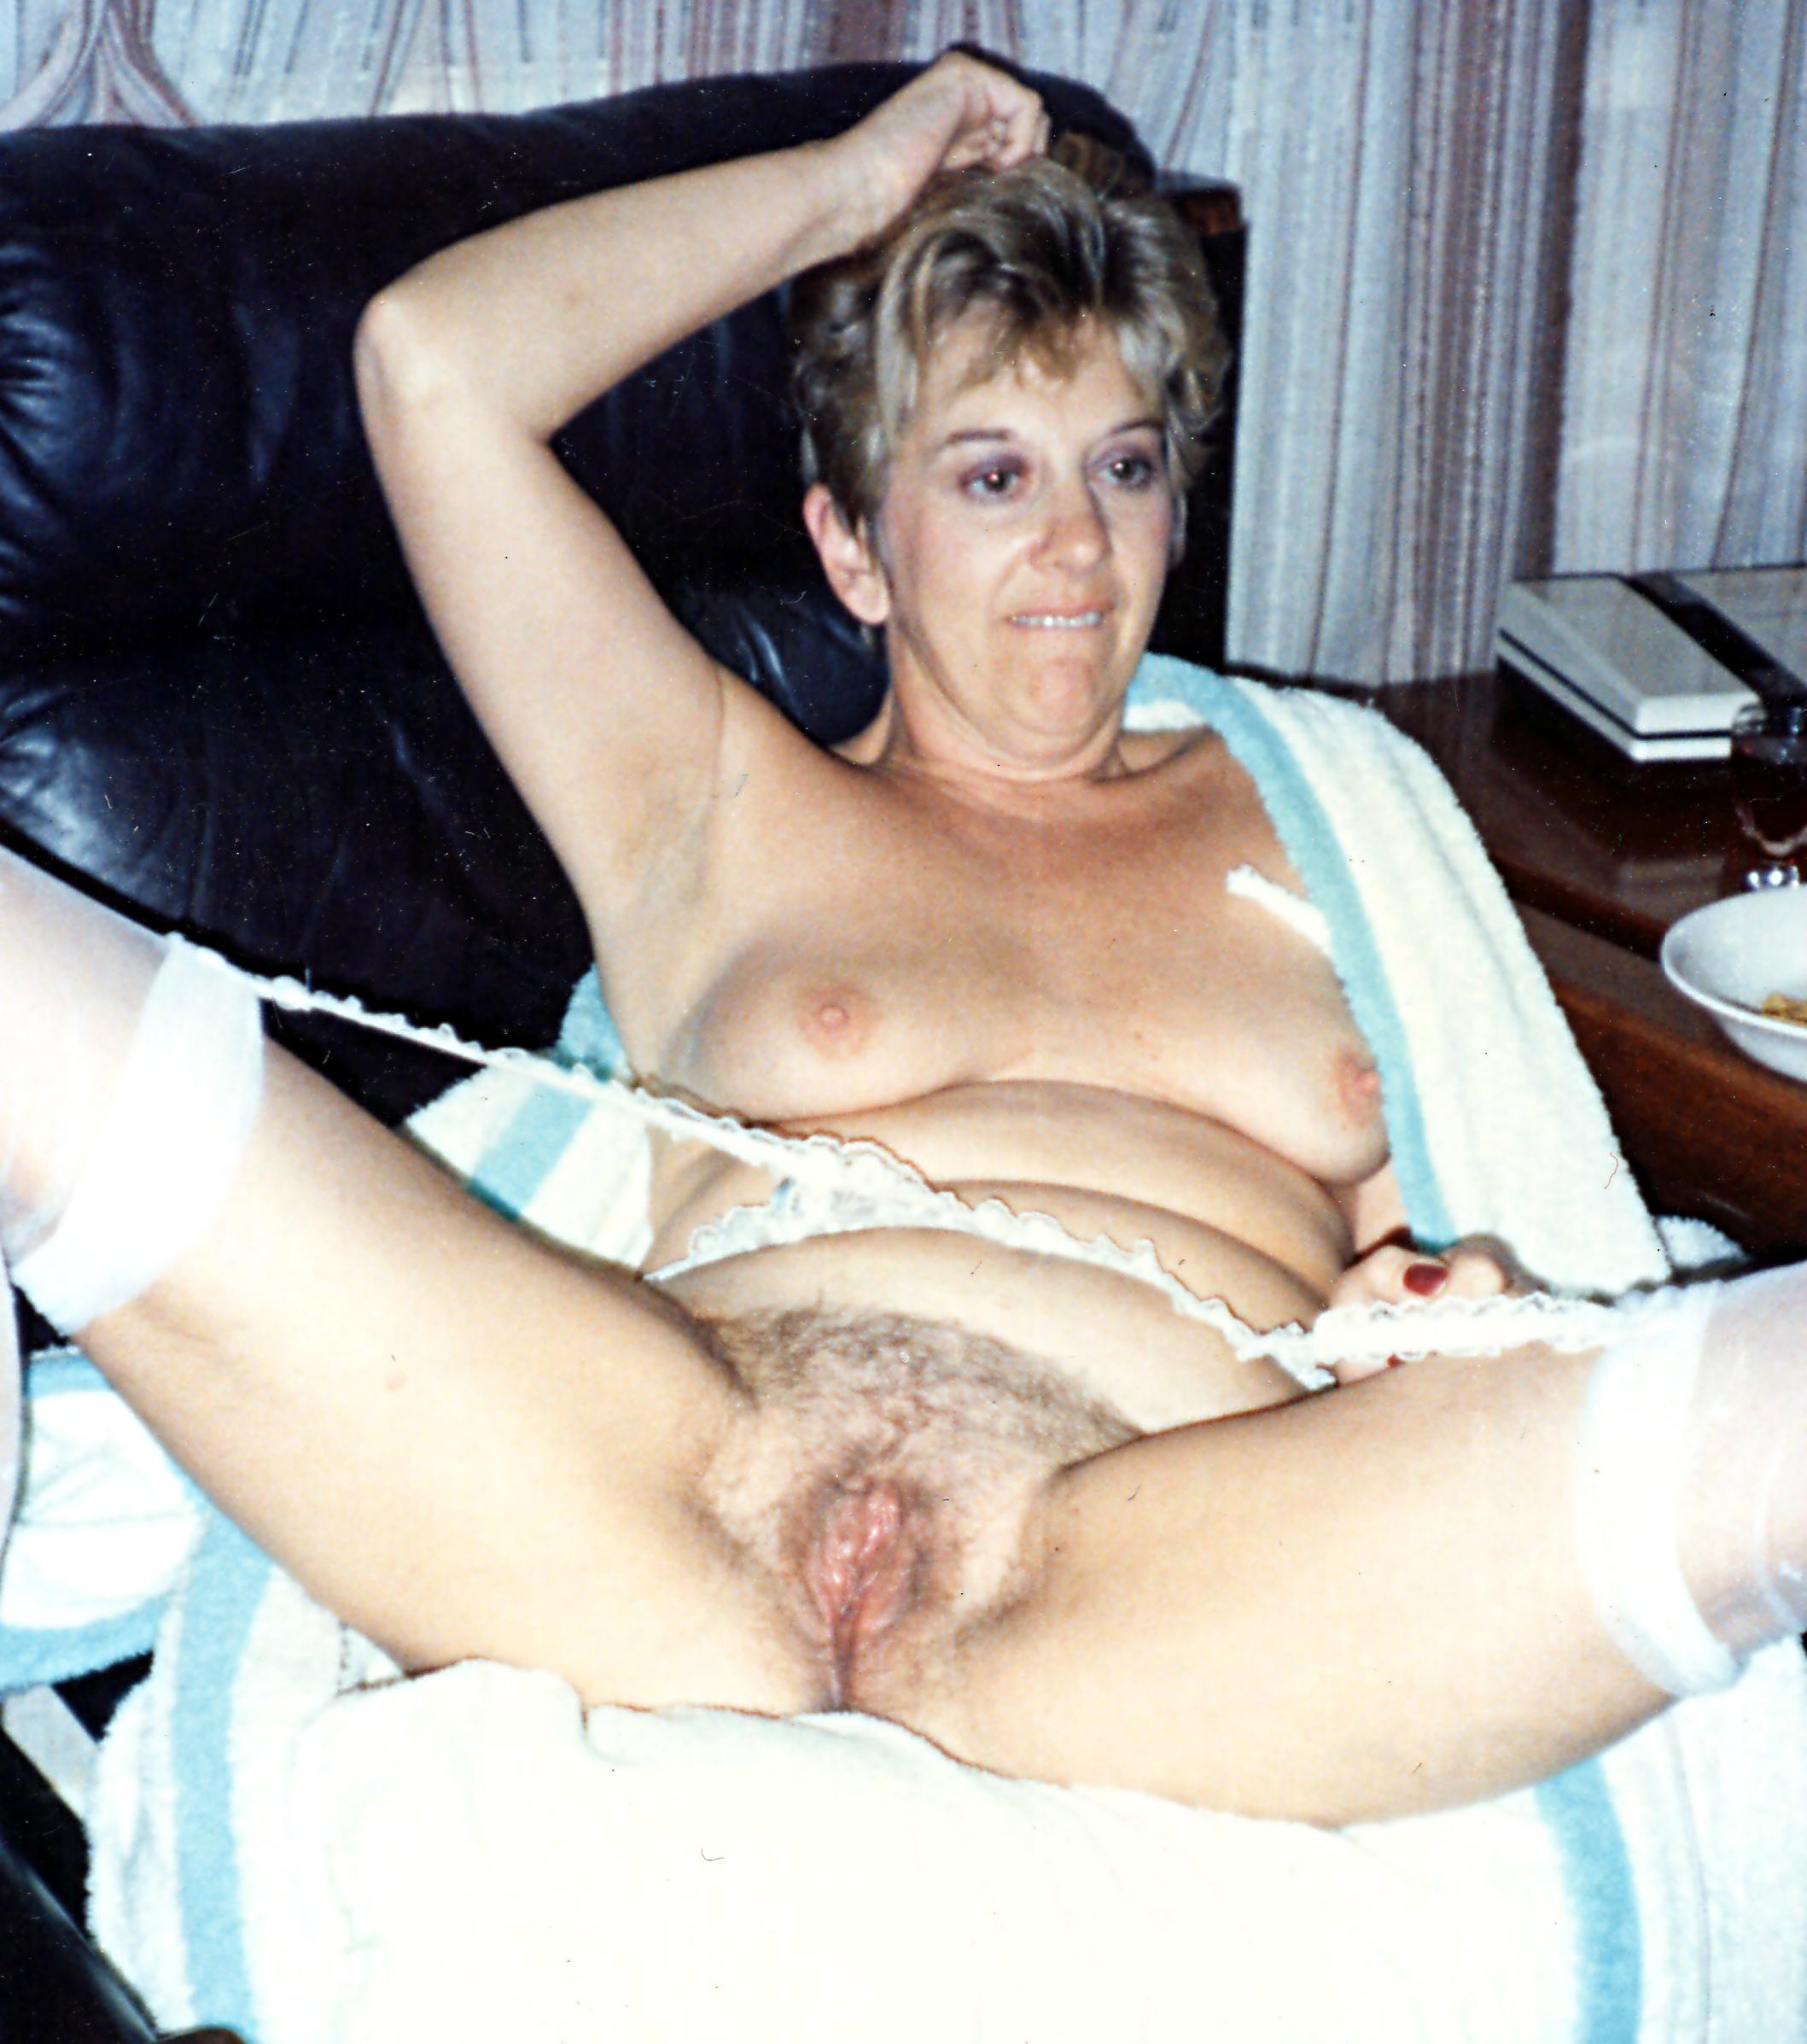 Polaroids of my wife naked